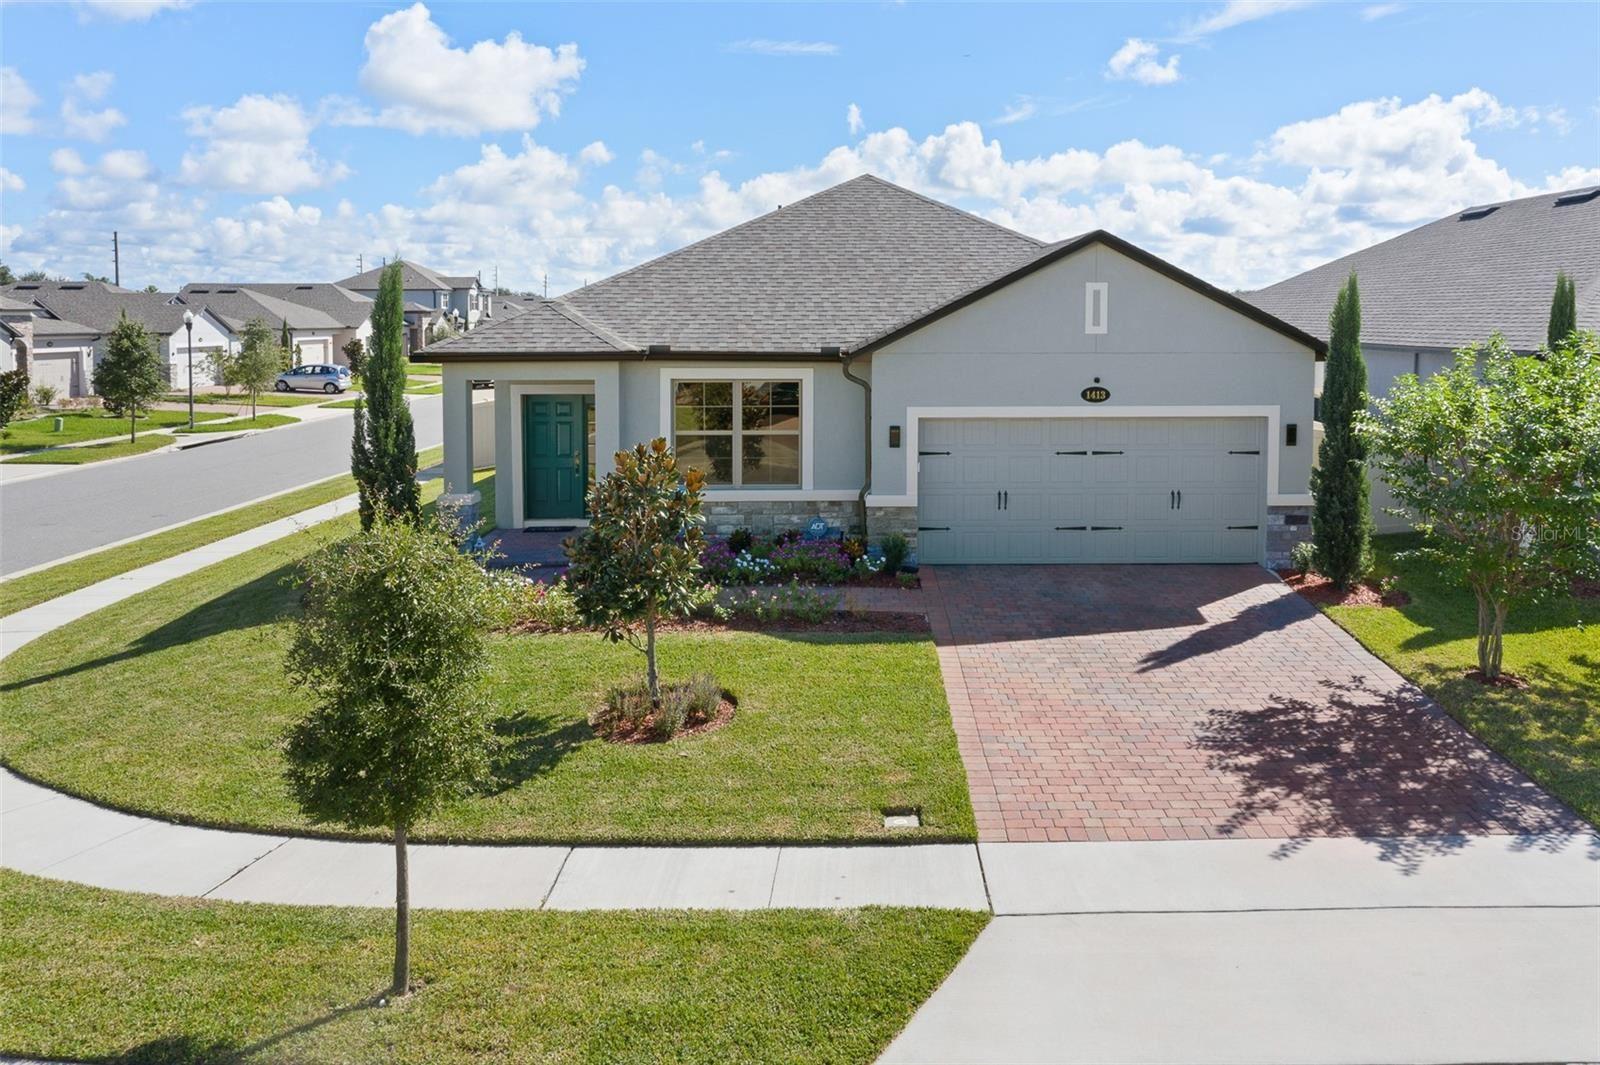 1413 CLEAR BROOK PLACE, Saint Cloud, FL 34772 - #: O5979538